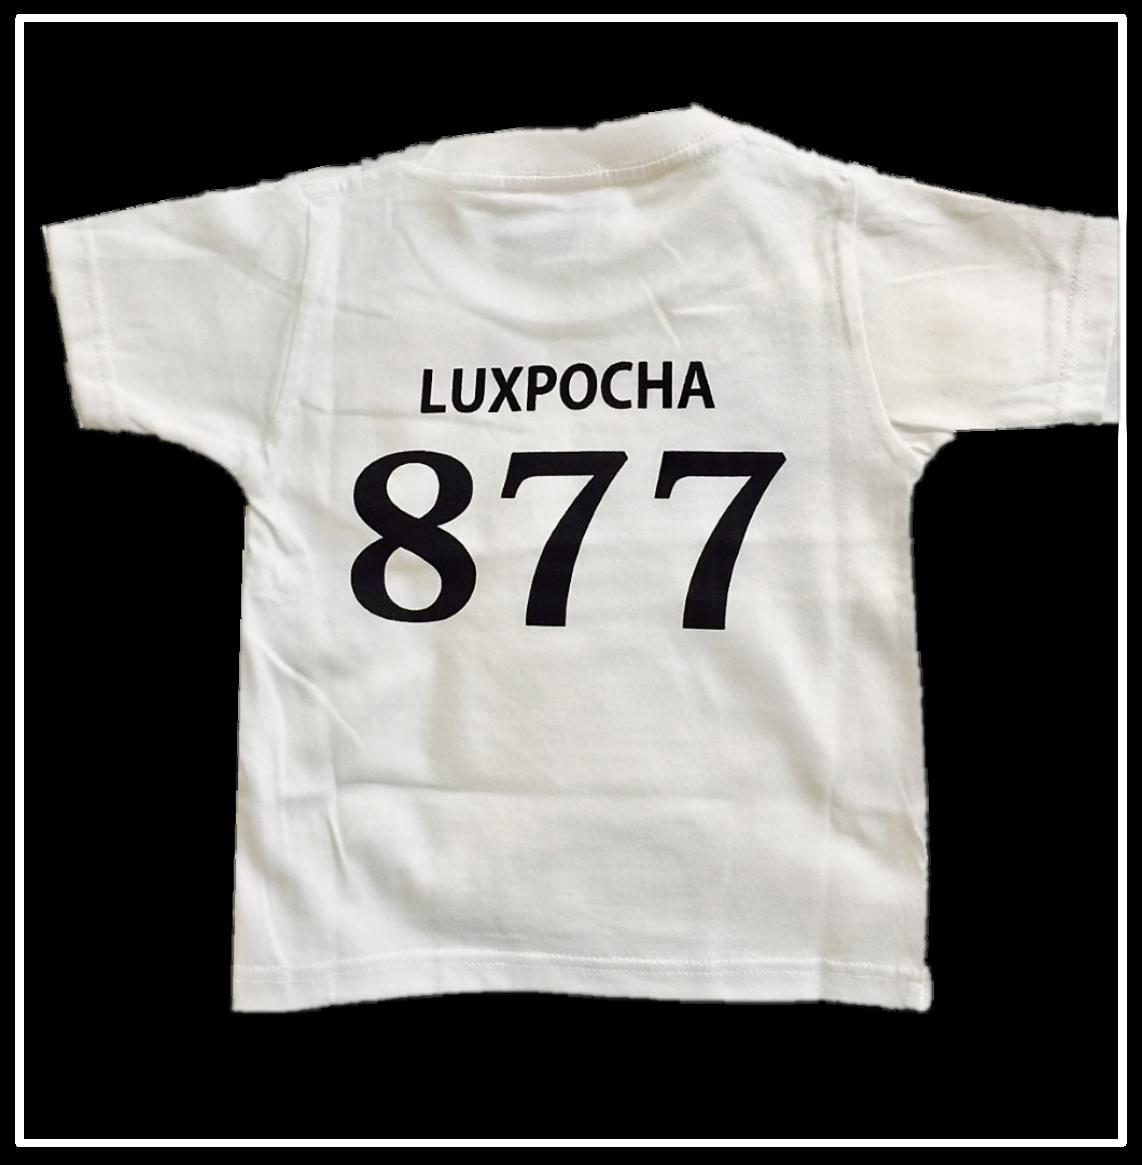 LUXPOCHA877 Kidsサイズ Tシャツ ホワイト130cm